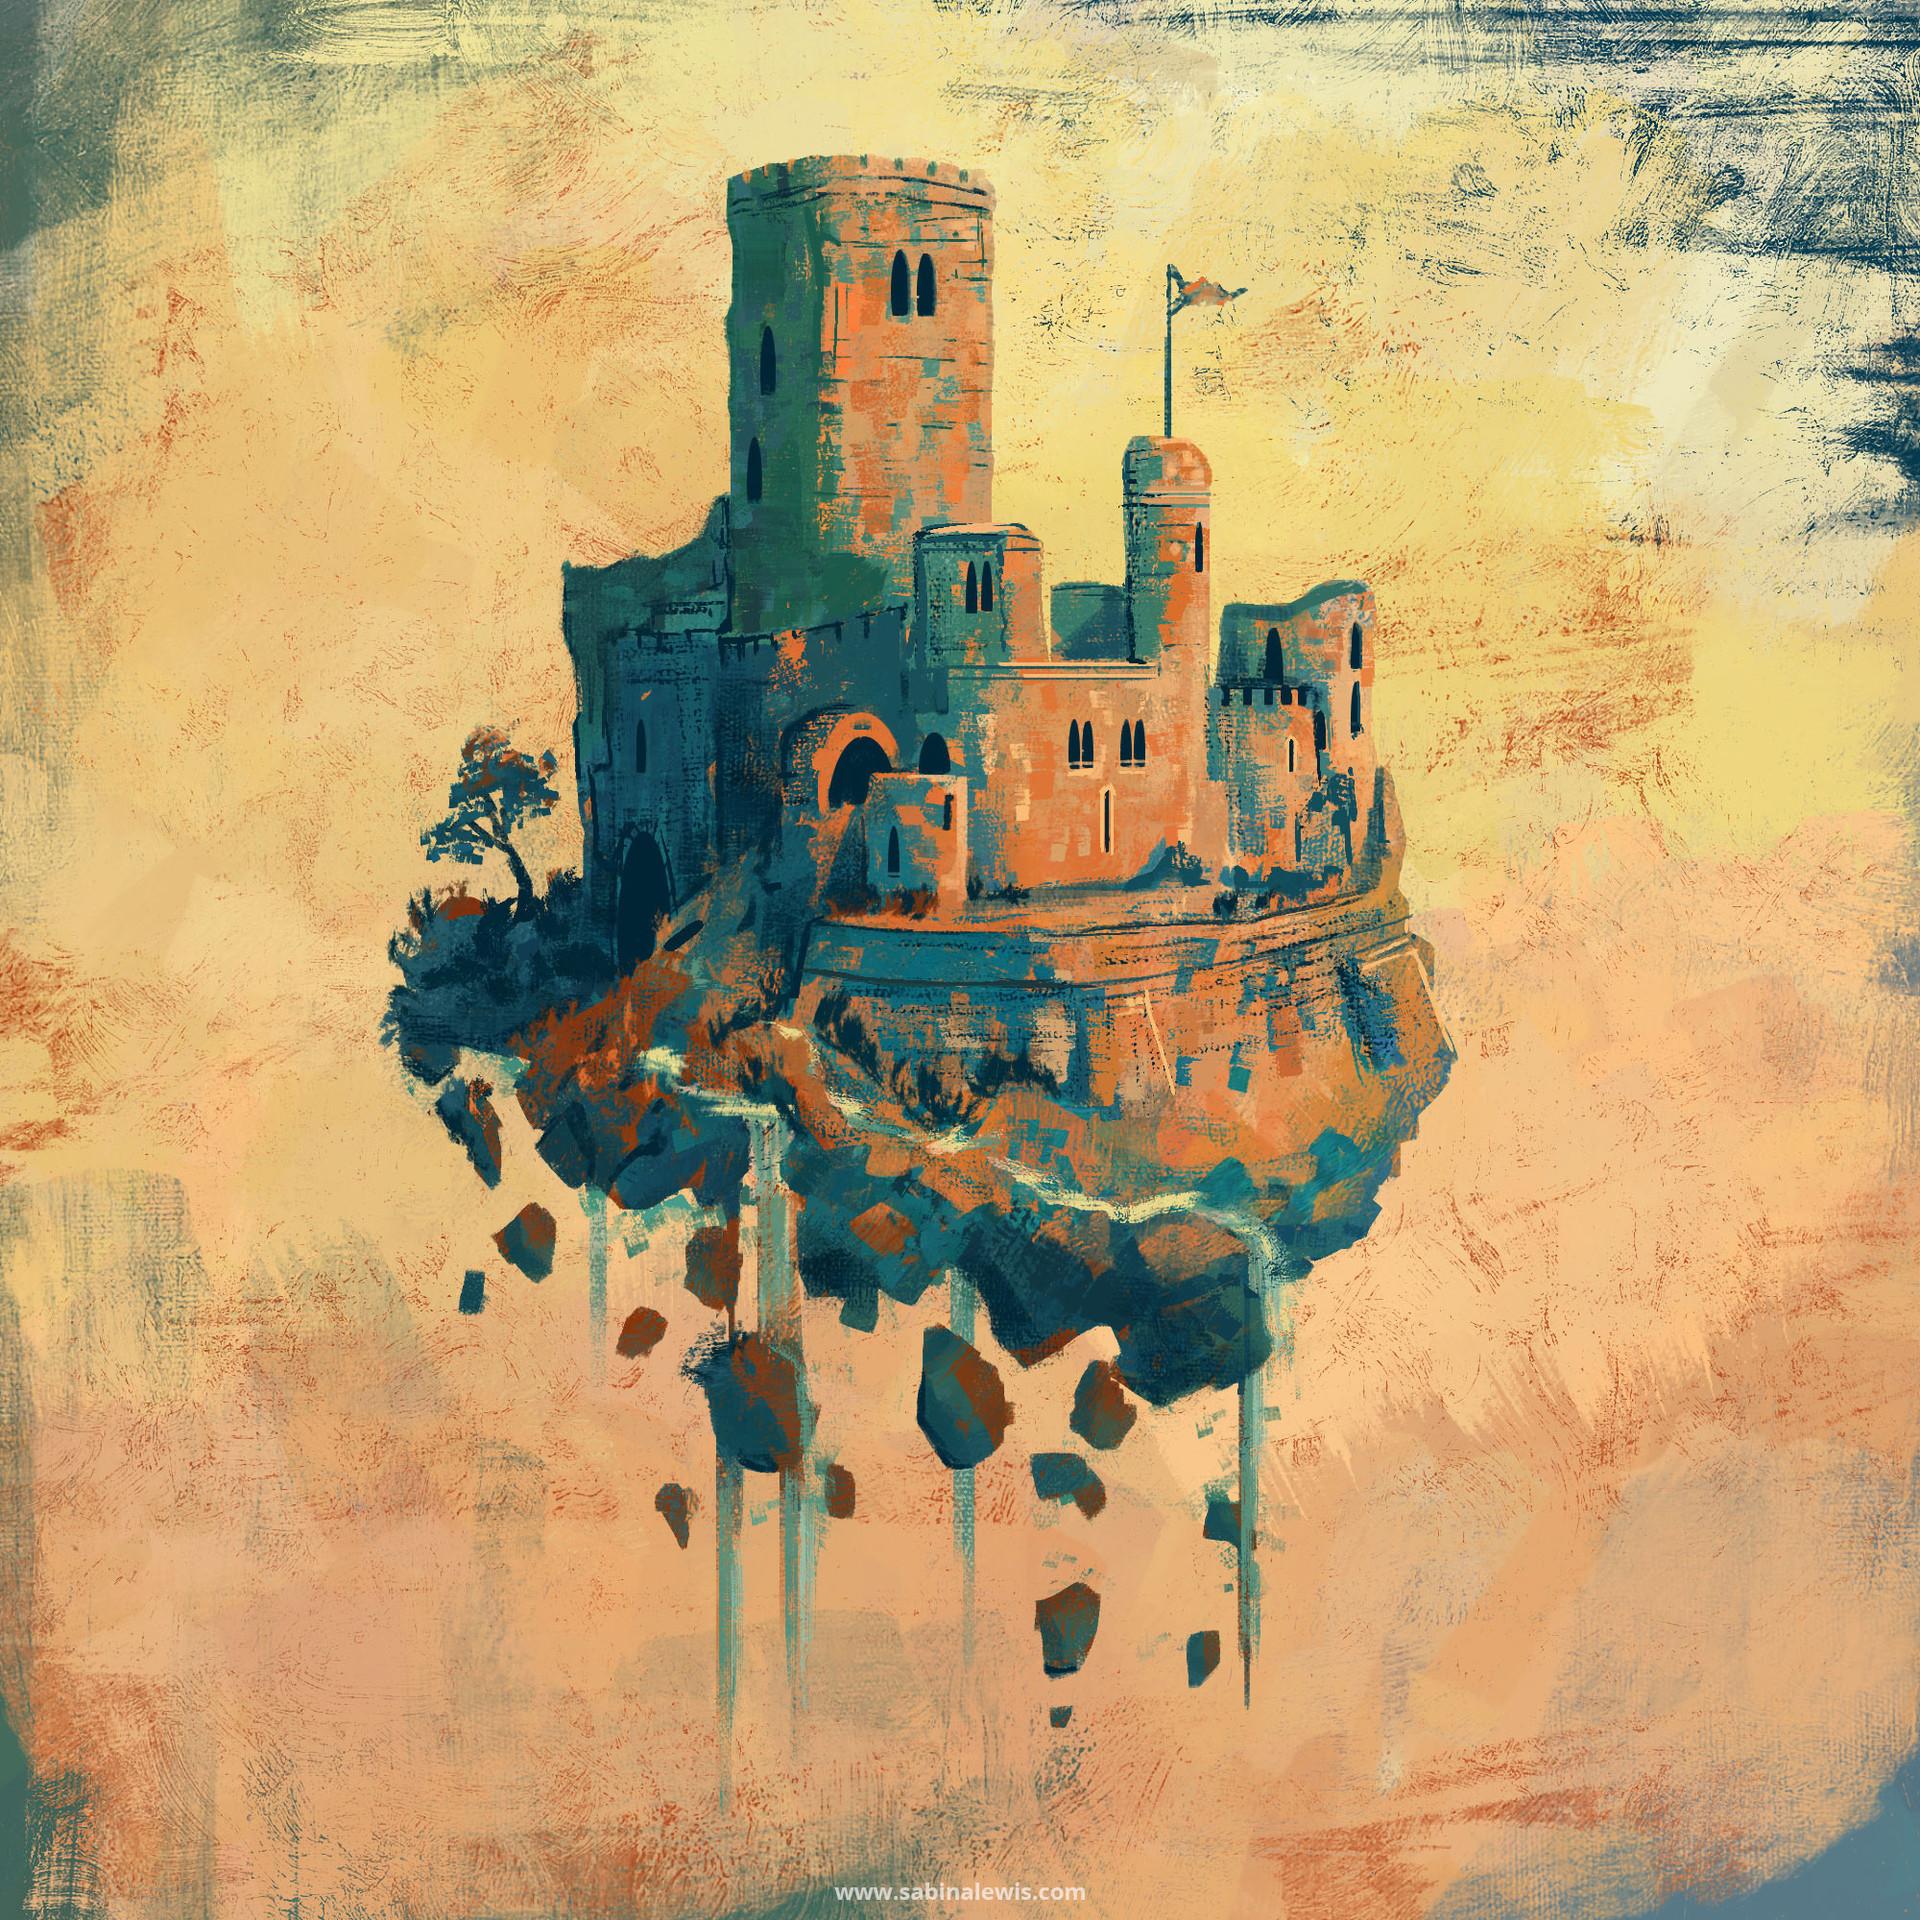 Sabina lewis 01 castle